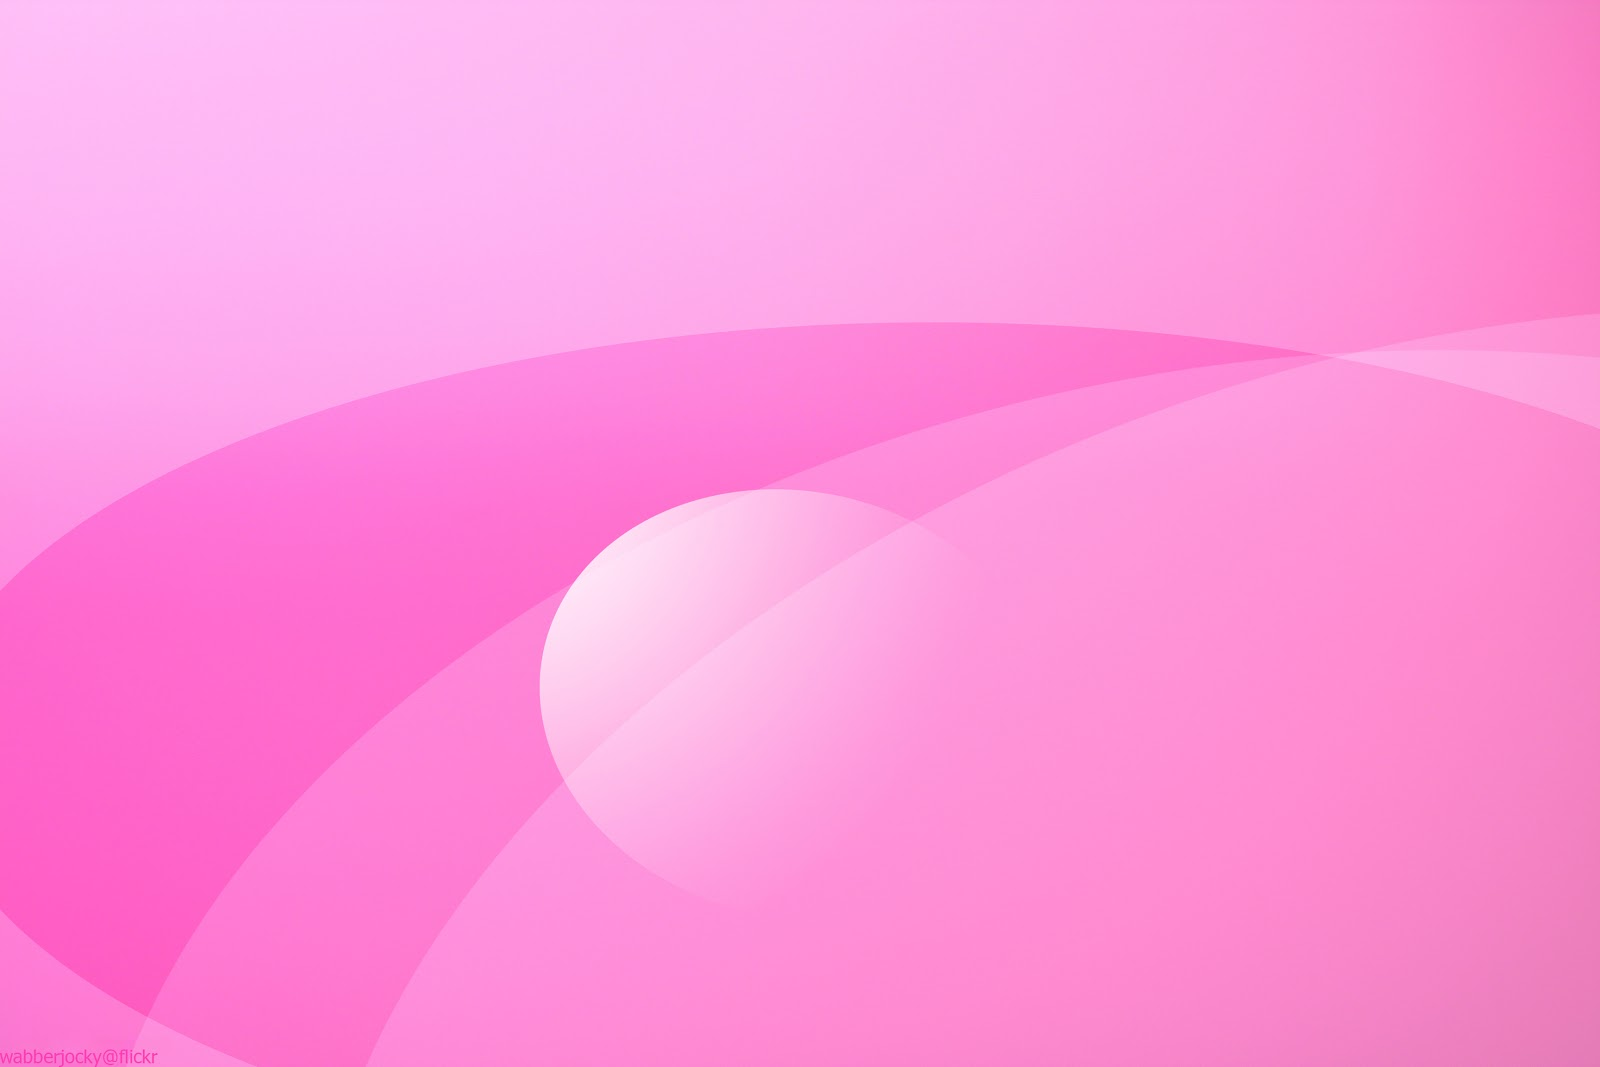 Imagensnet papel de parede rosa - Papel de pared ...